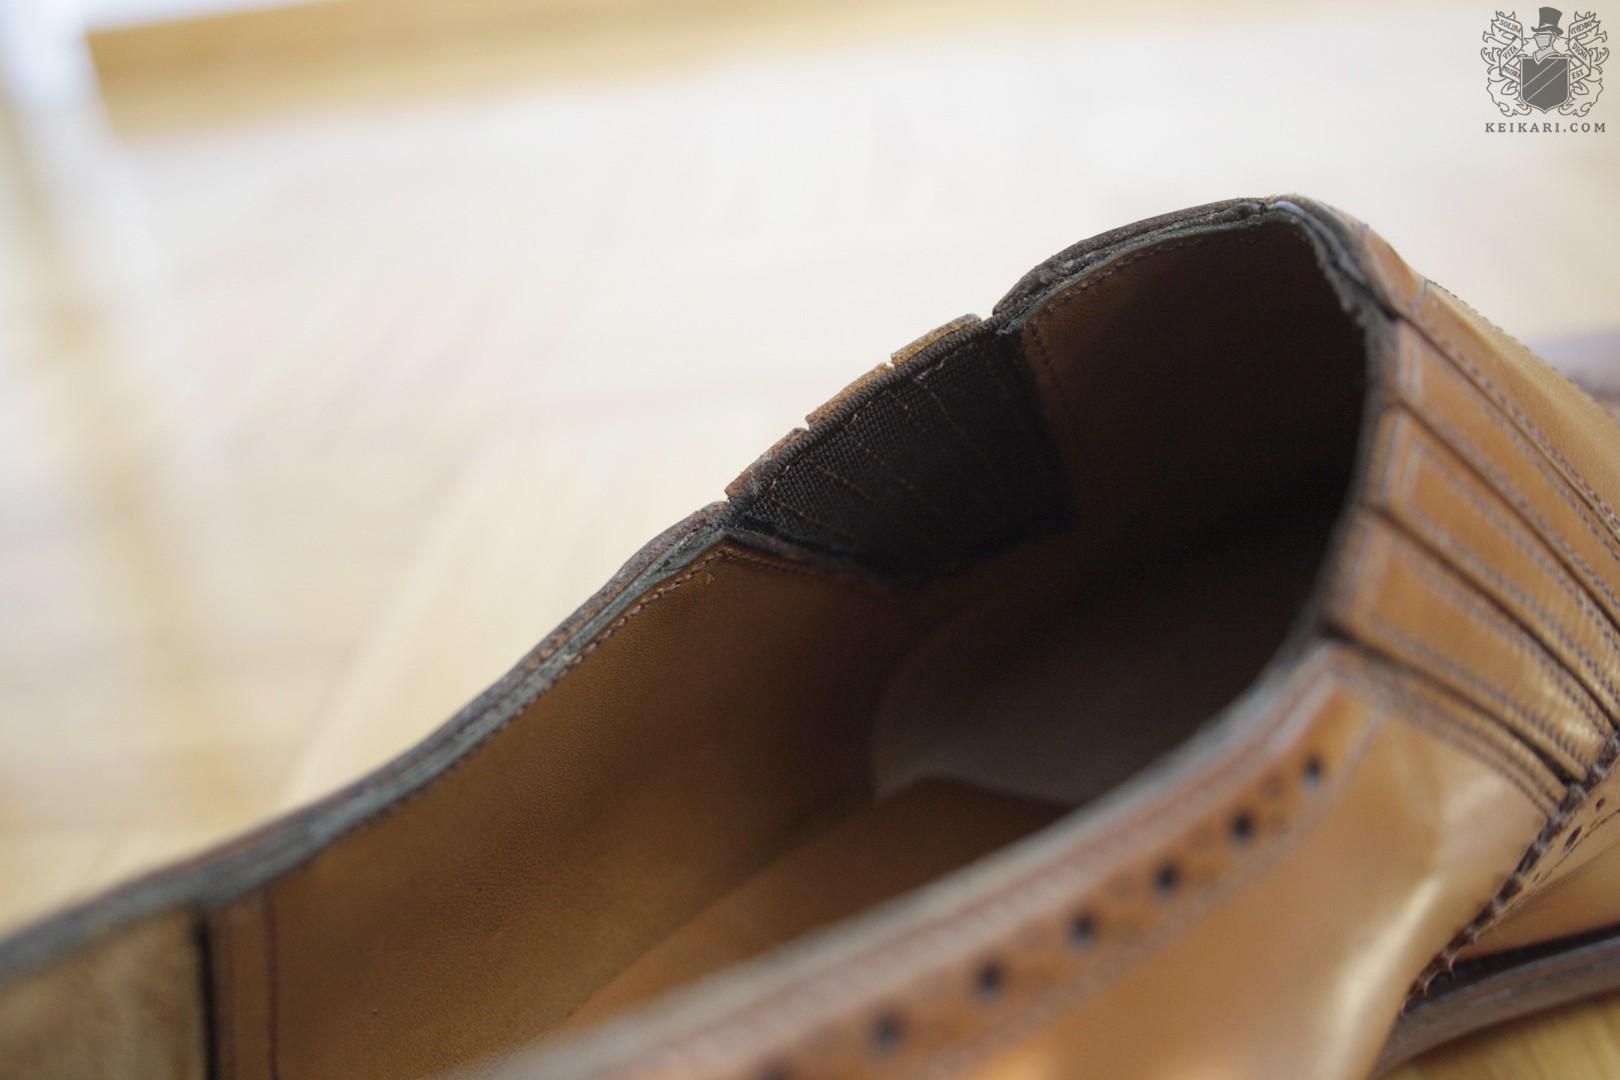 edward_green_kibworth_side_elastic_shoes_at_keikari_dot_com11